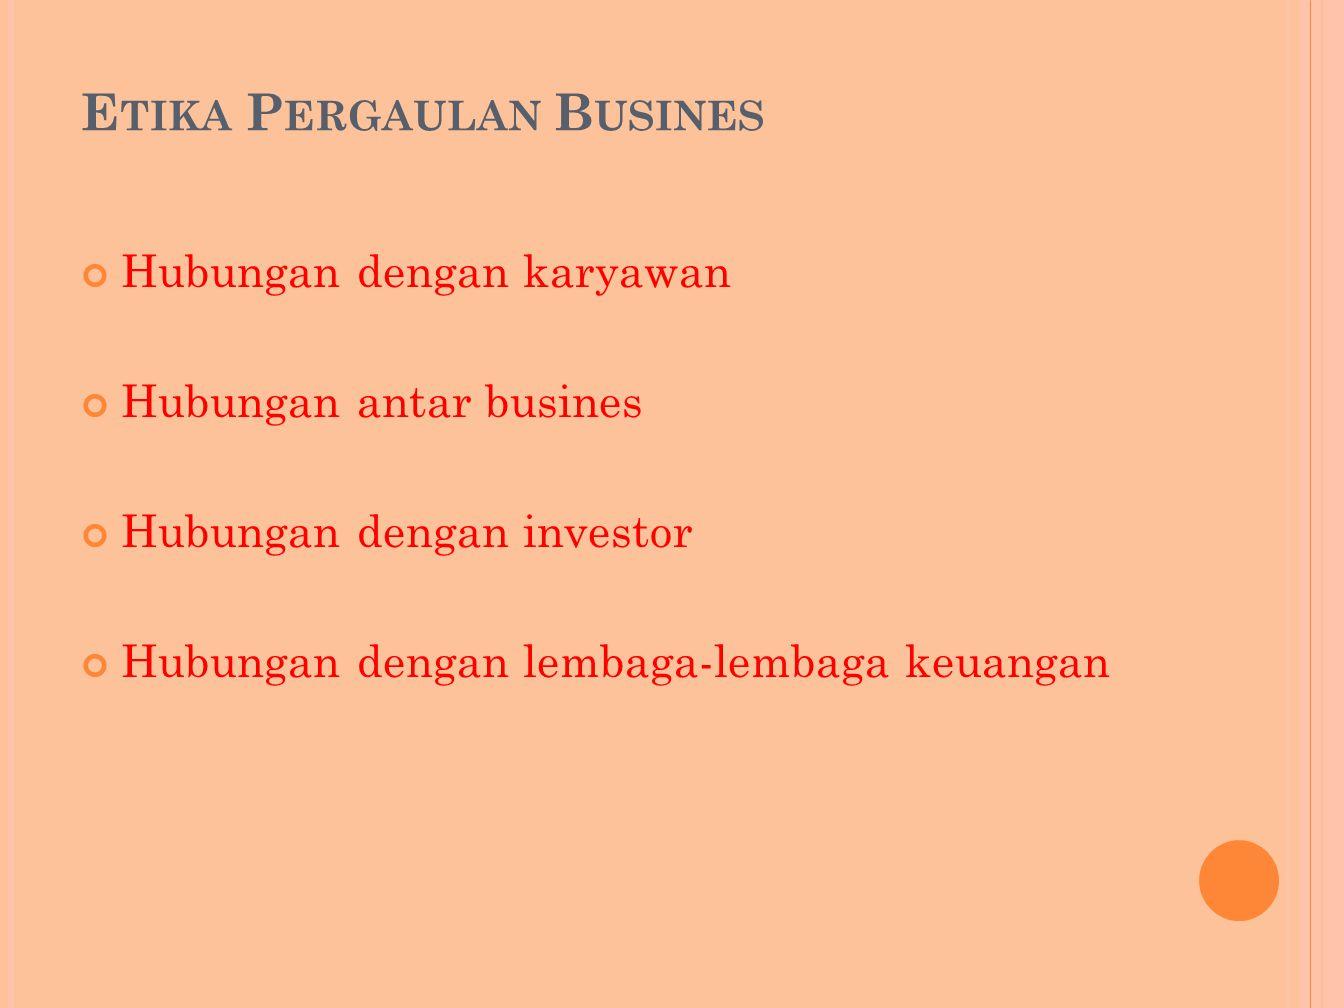 E TIKA P ERGAULAN B USINES Hubungan dengan karyawan Hubungan antar busines Hubungan dengan investor Hubungan dengan lembaga-lembaga keuangan